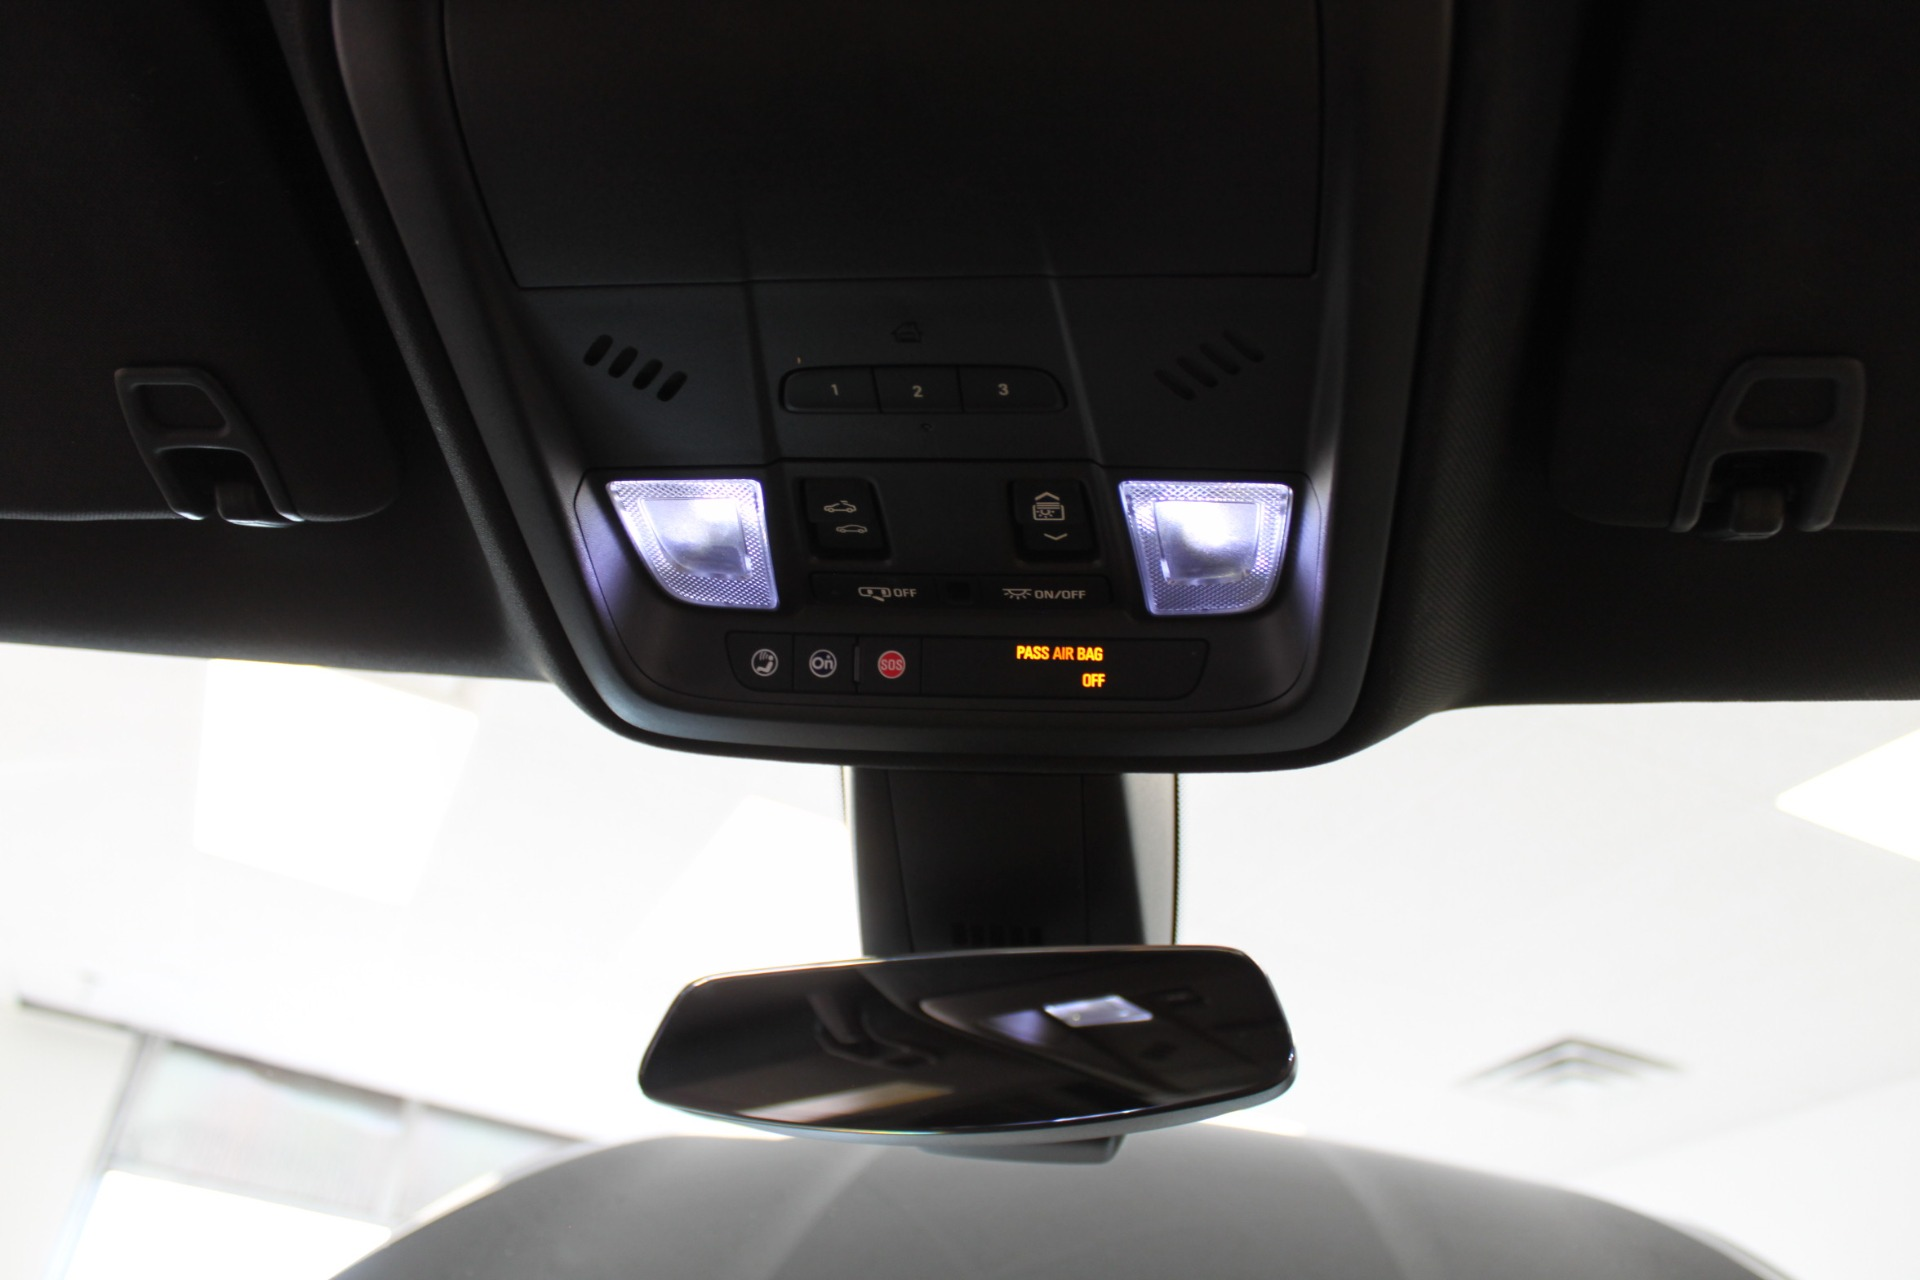 Used-2017-Cadillac-XT5-Luxury-All-Wheel-Drive-Luxury-AWD-4X4